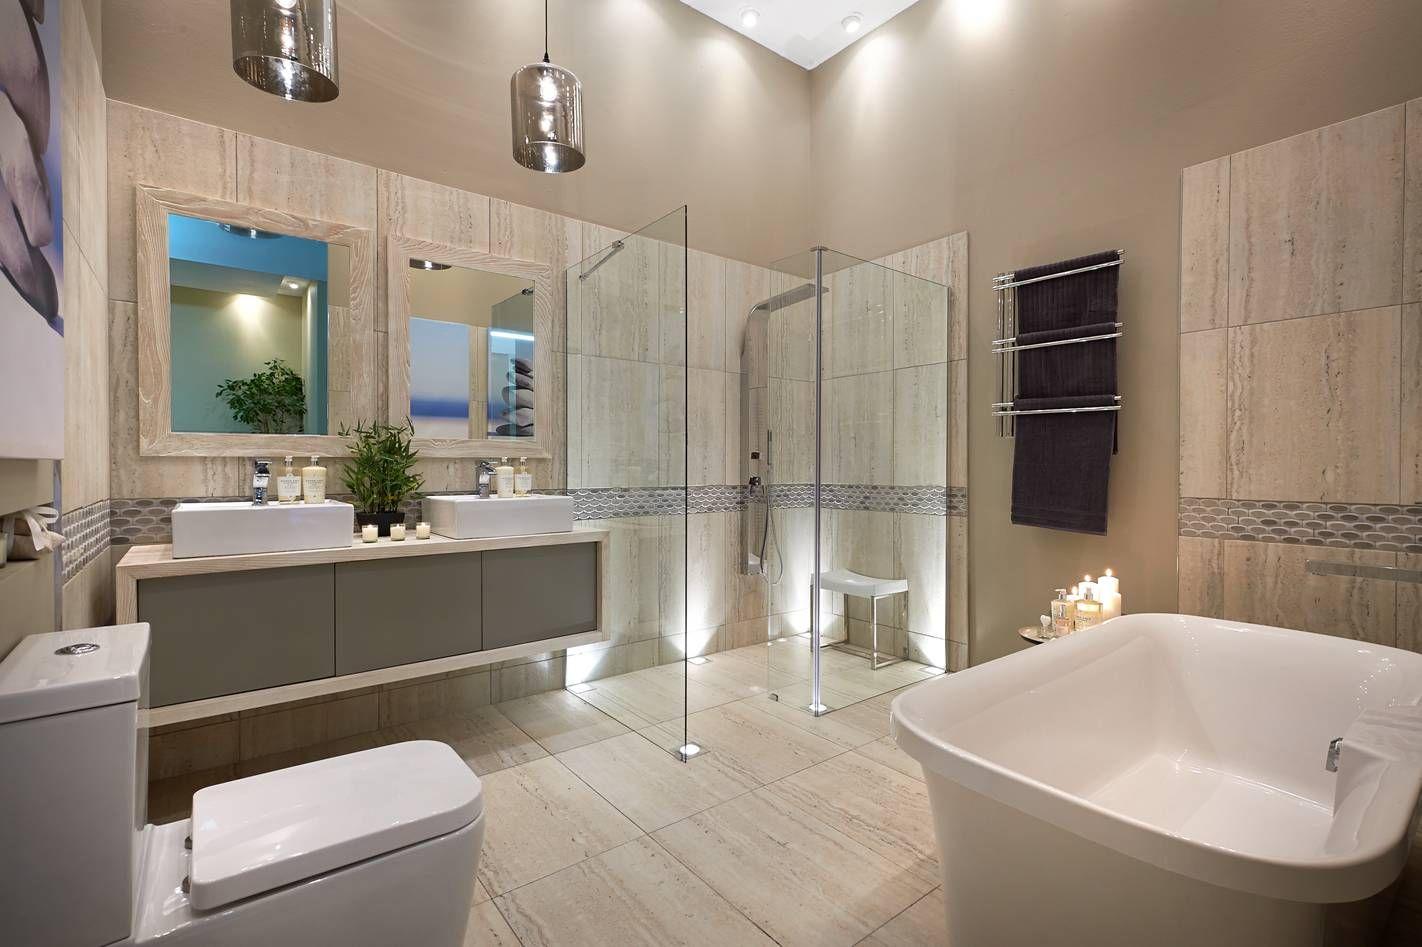 Image Result For Family Bathrooms  Bathroom  Pinterest  Family Alluring Bathroom Bazaar Design Ideas